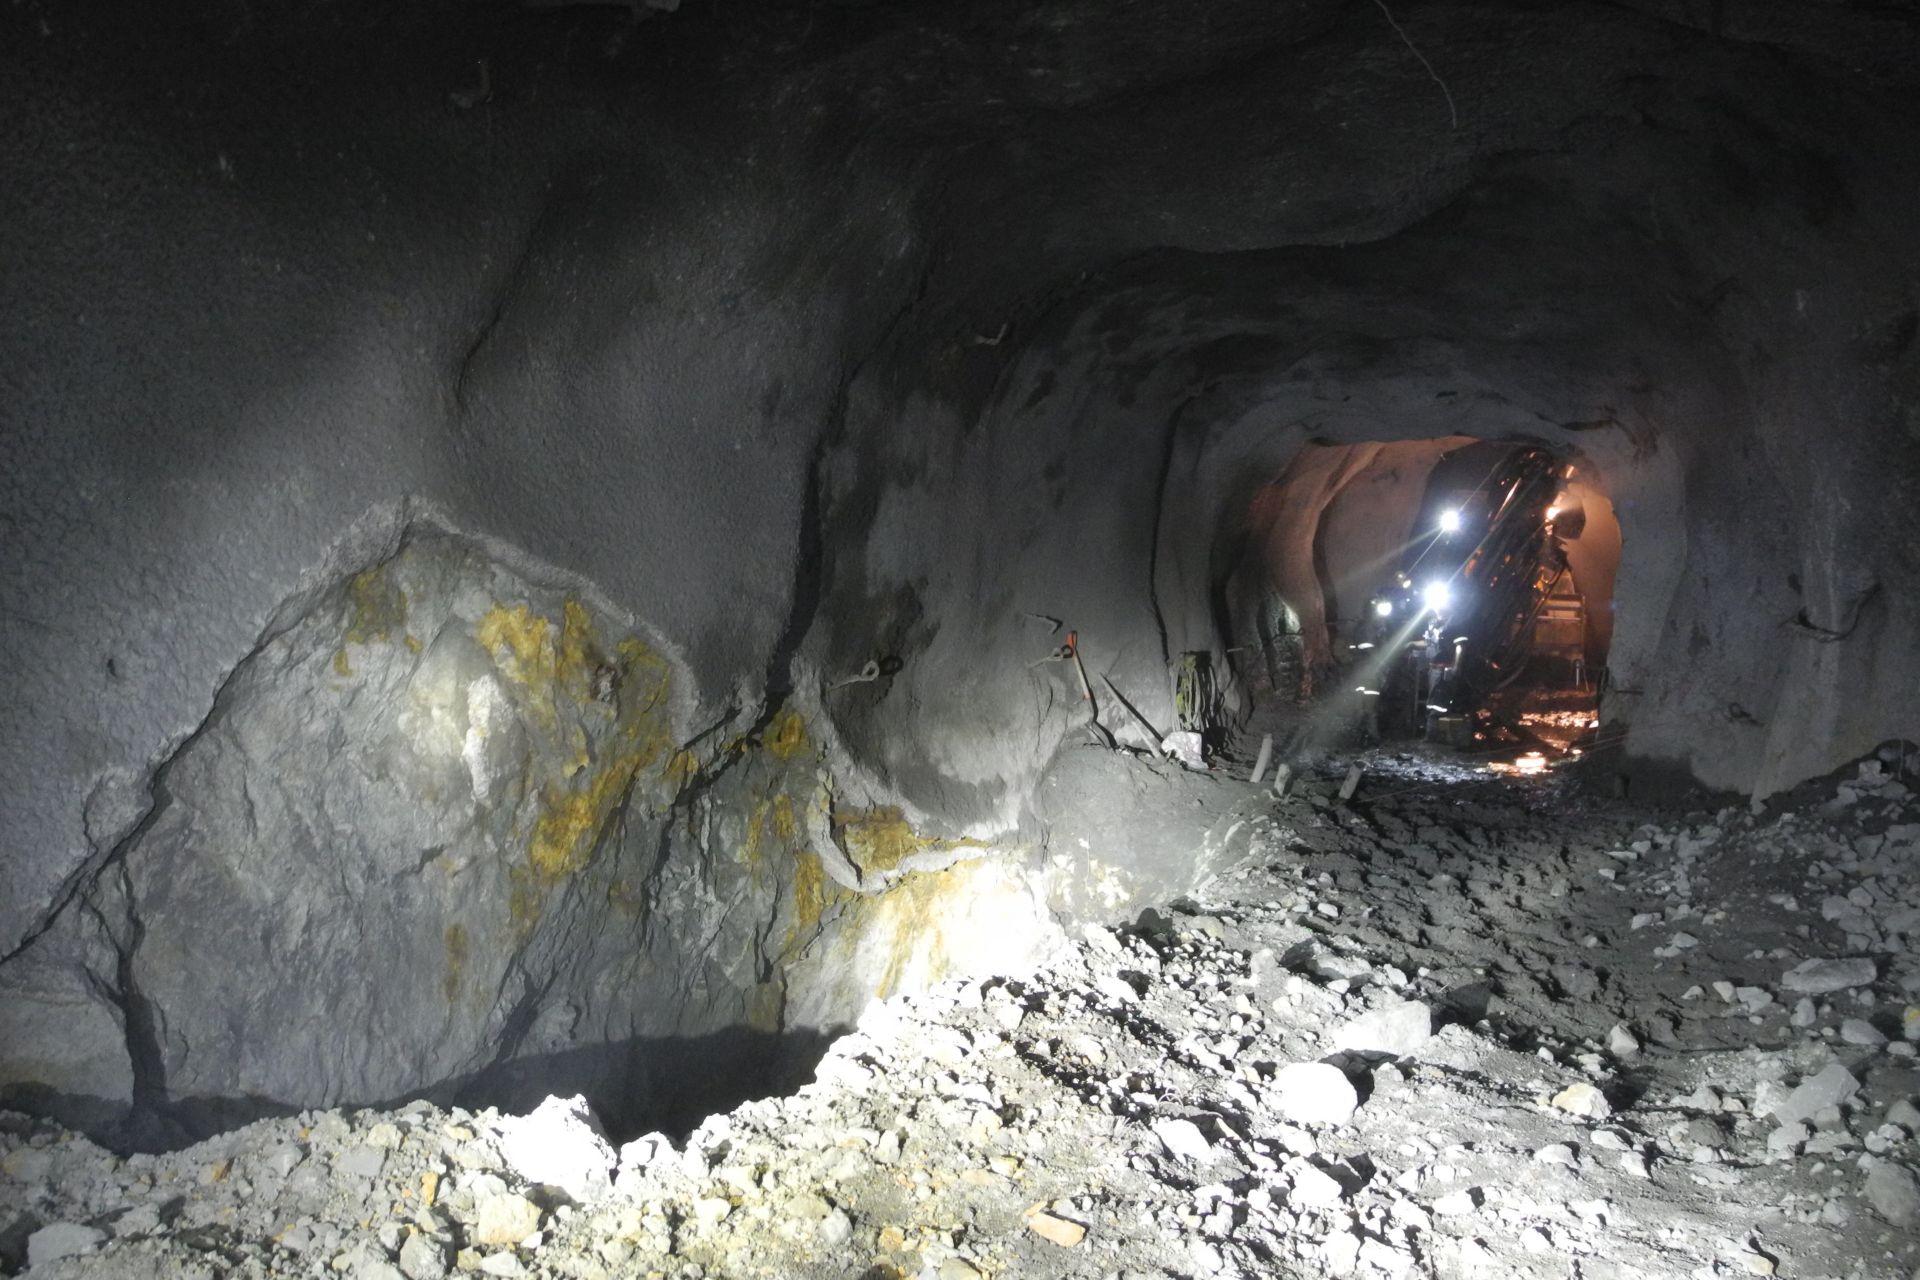 Silver mine in the Meixcan Heartland